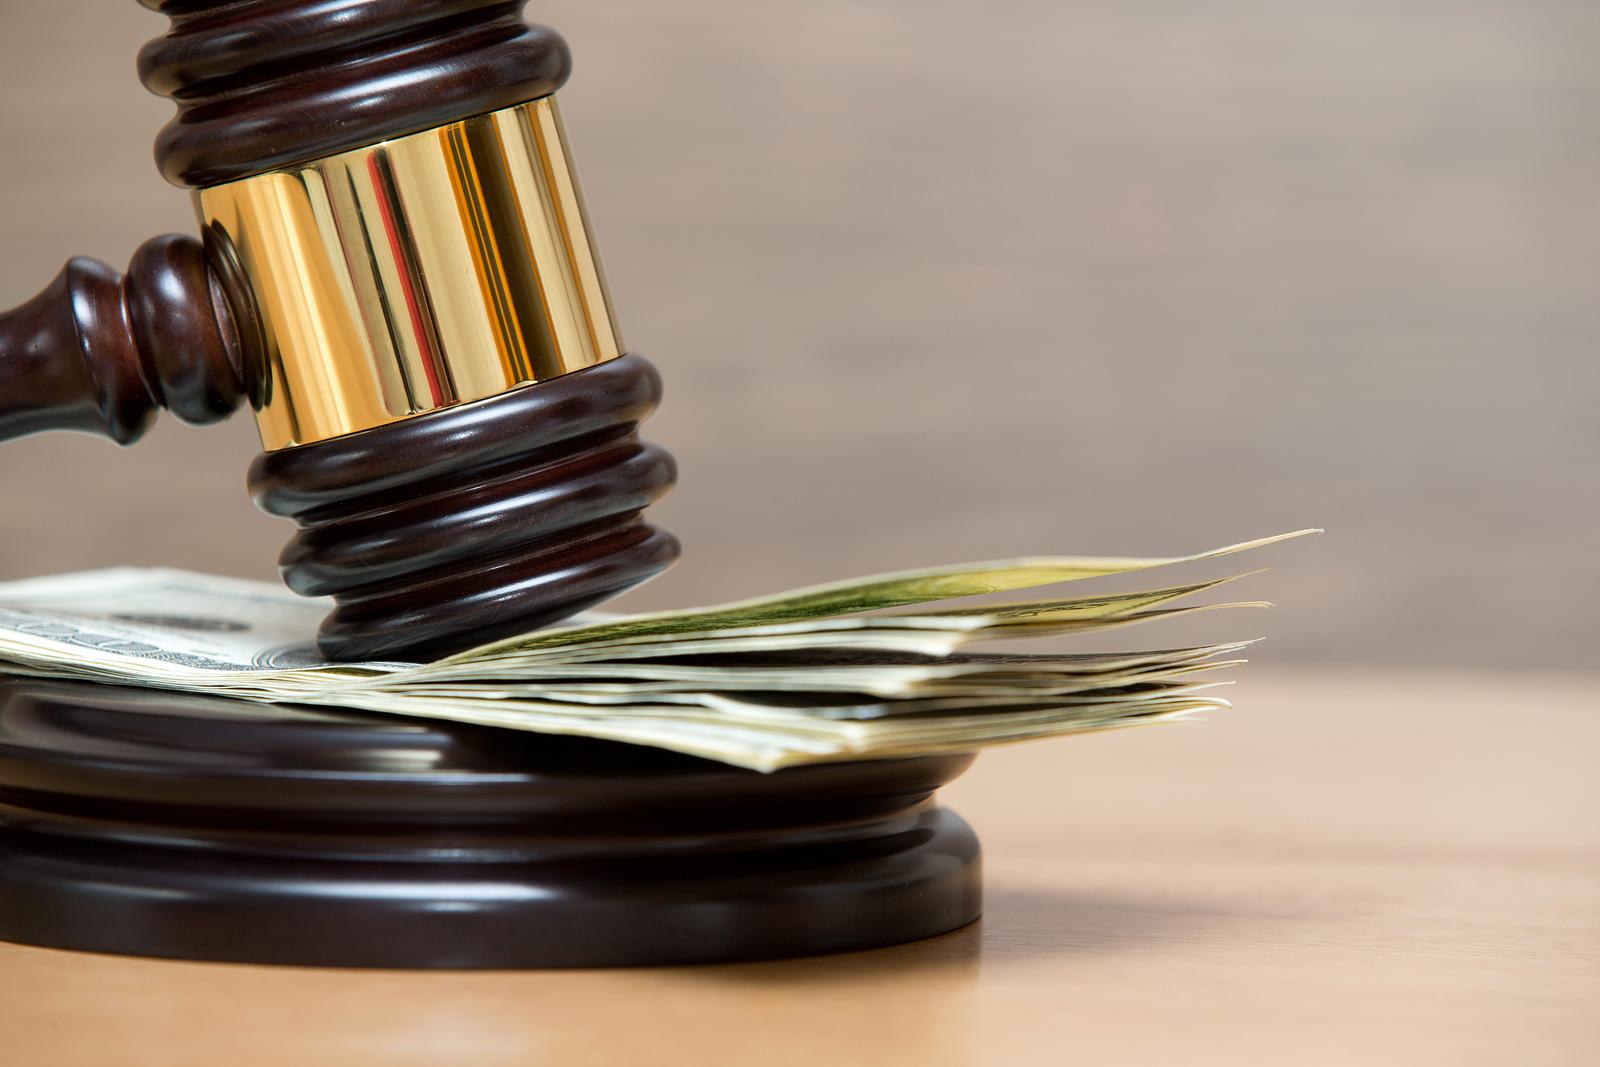 u.s. lawsuits